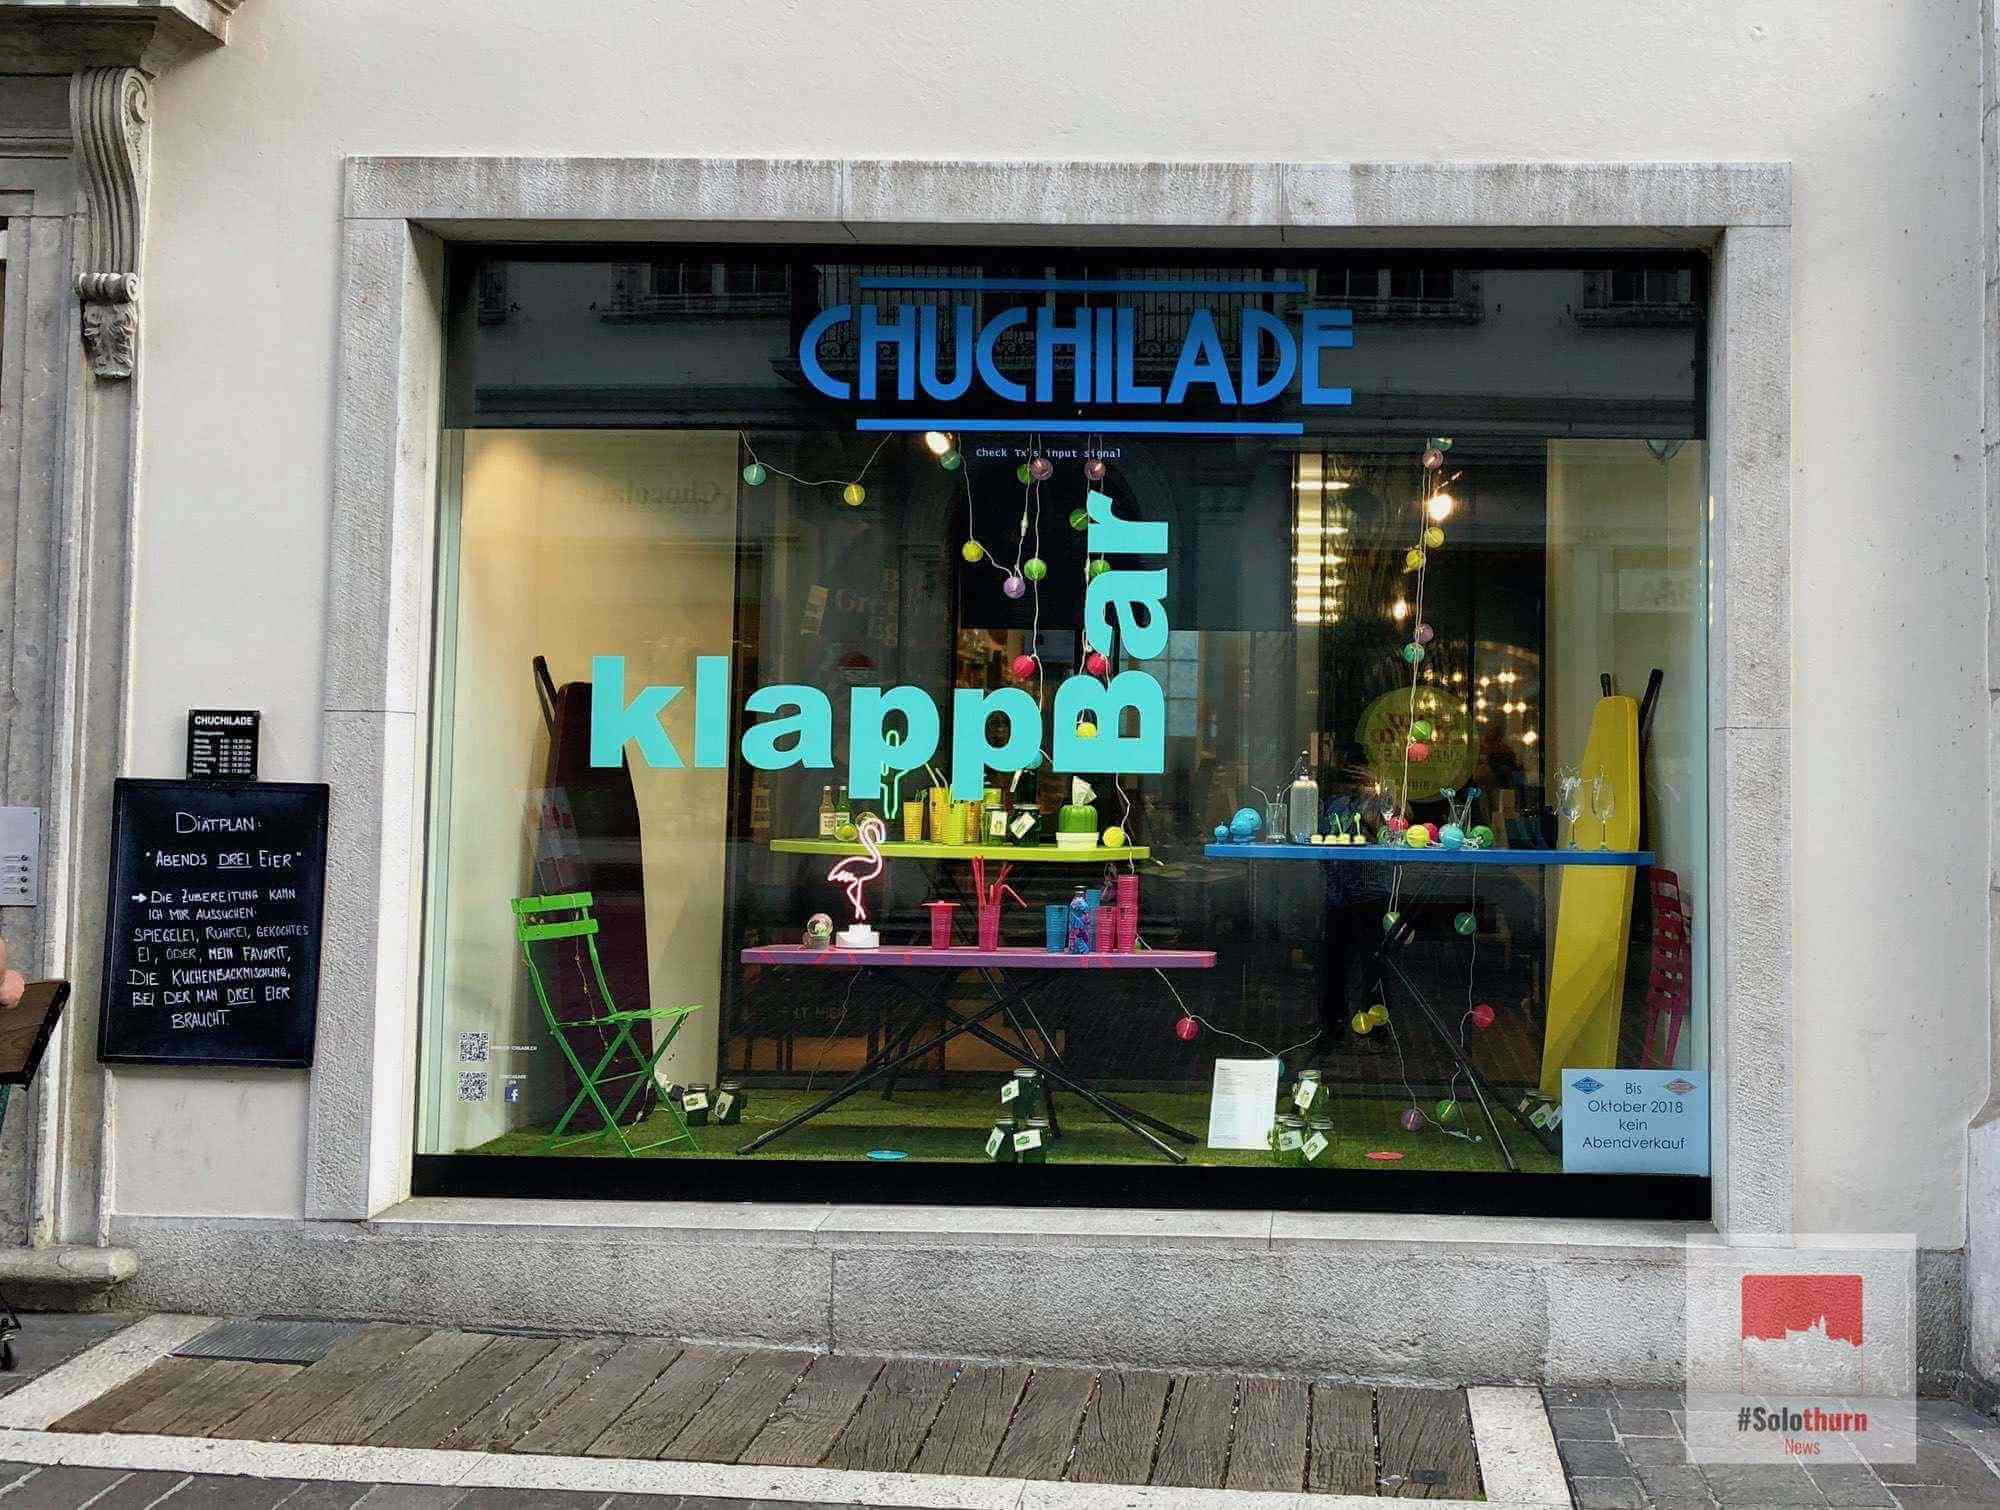 Chuchilade Solothurn